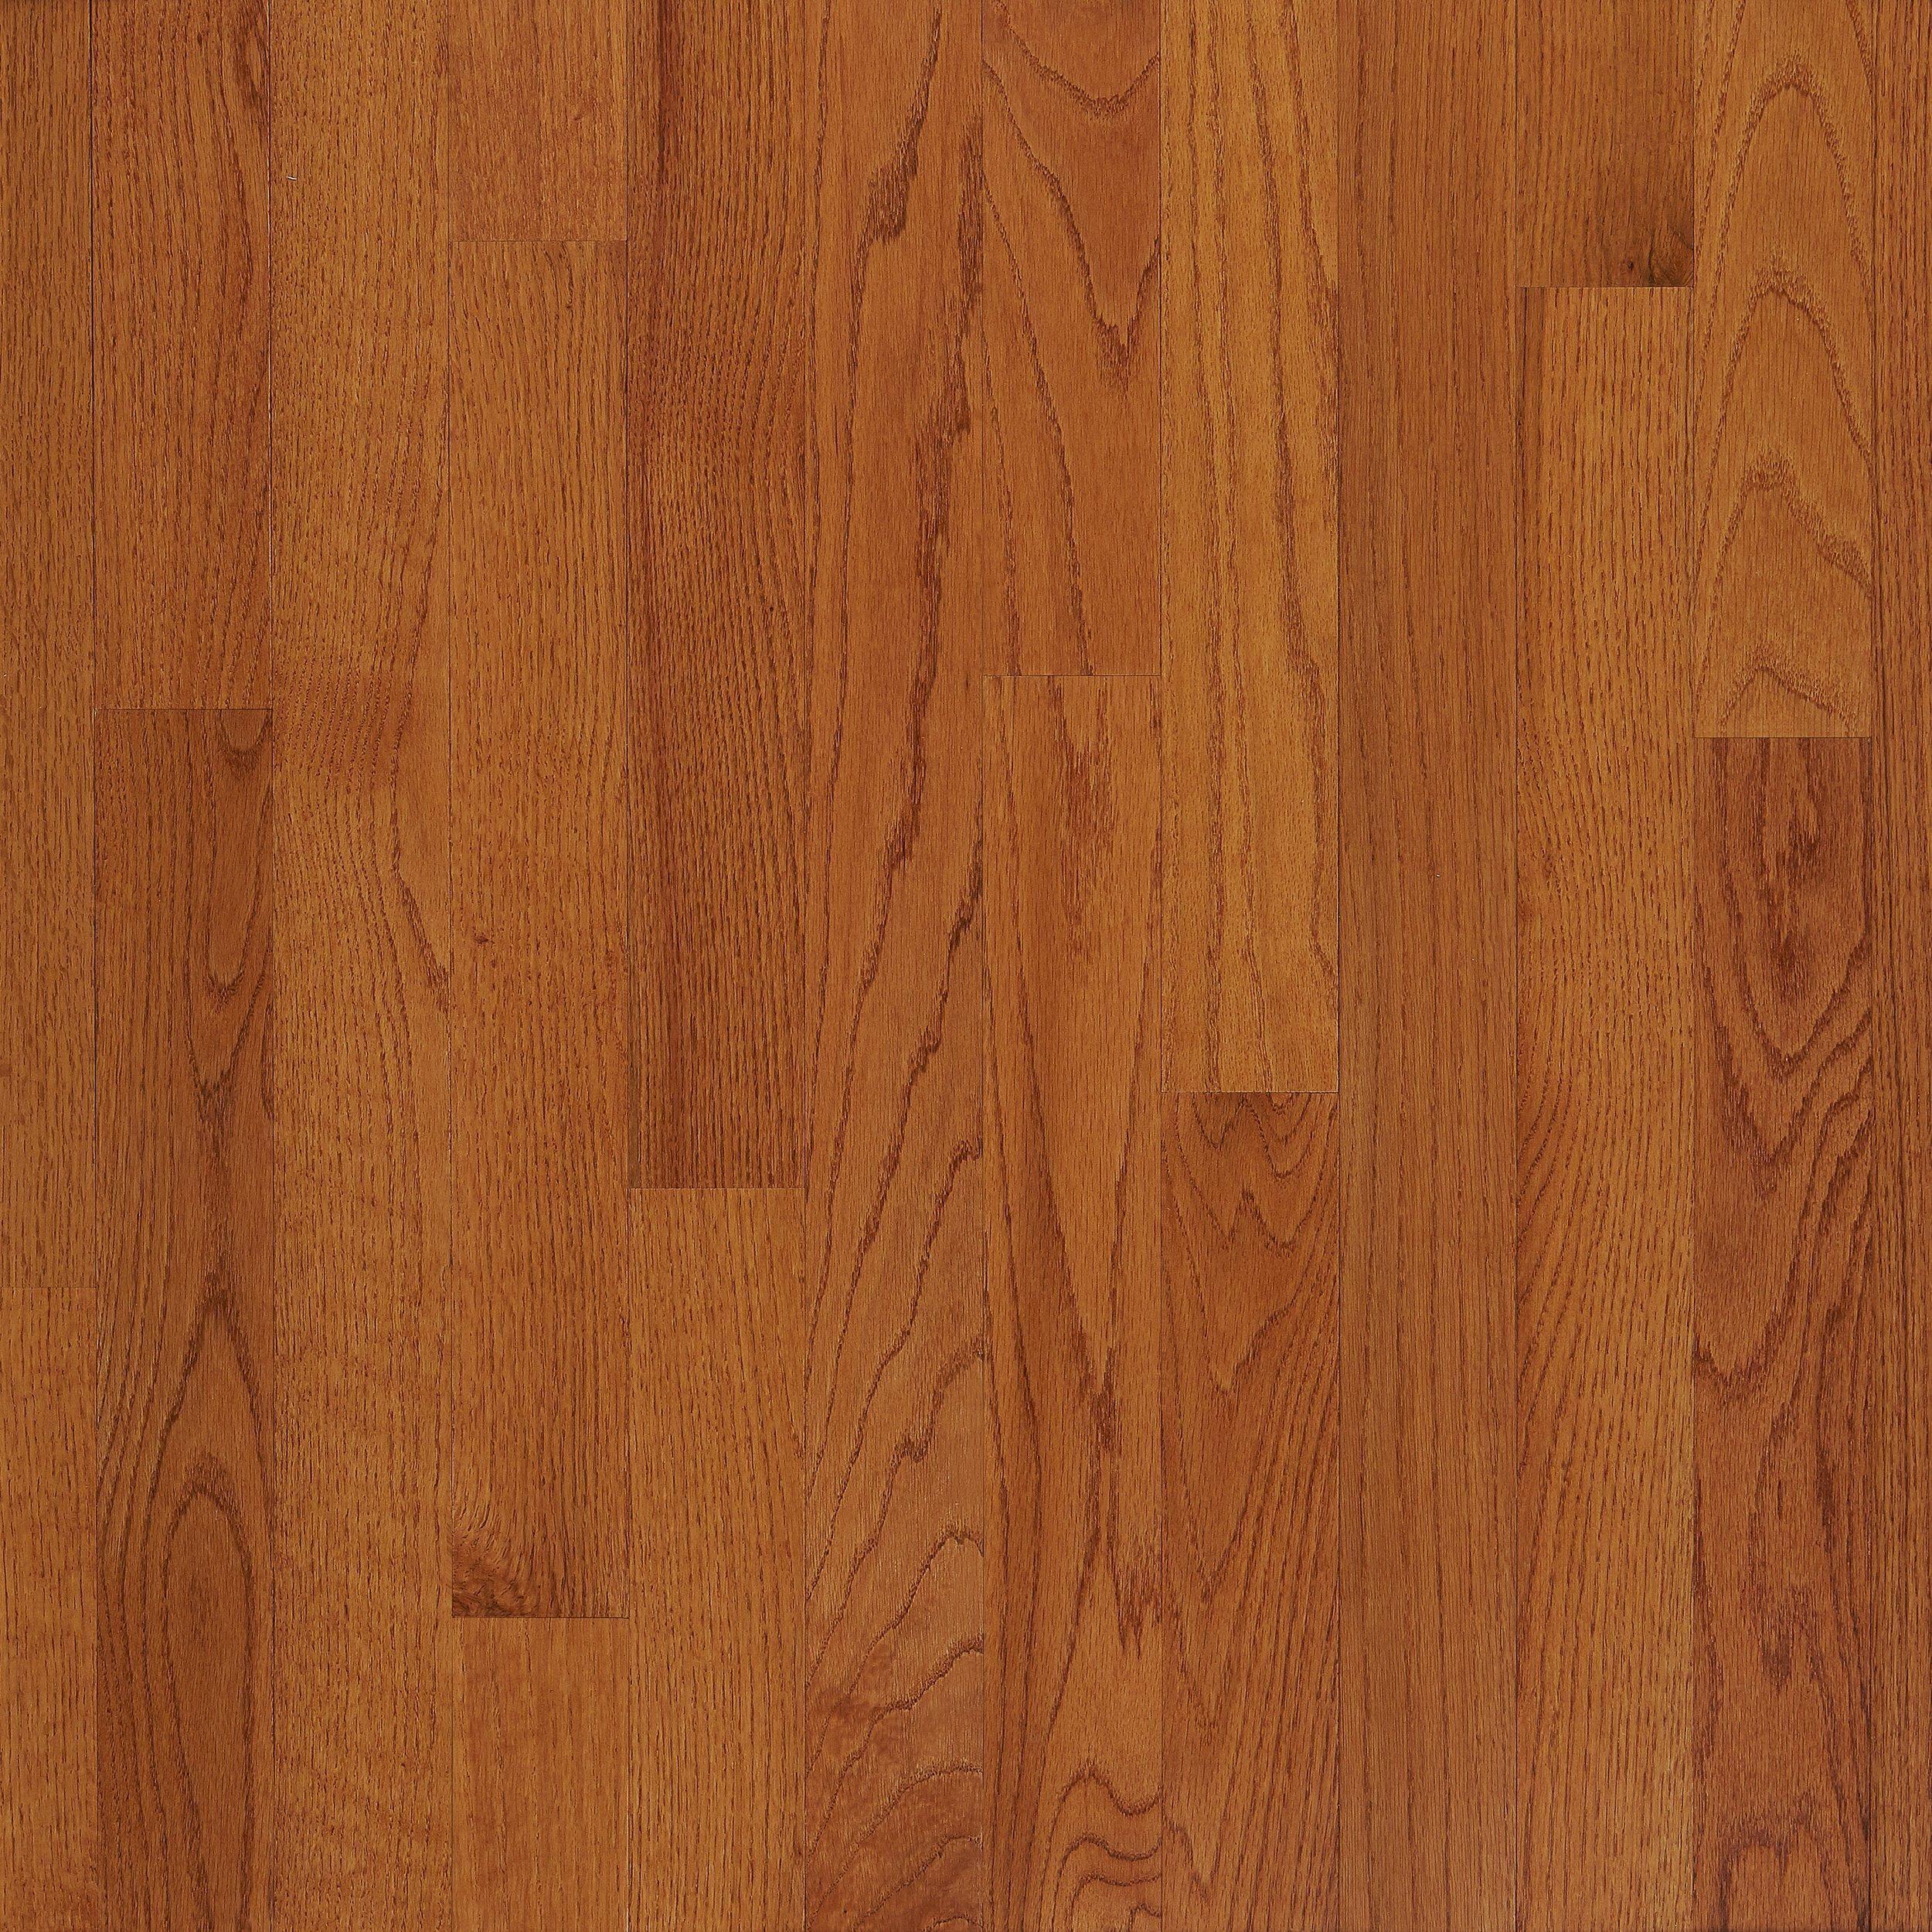 Butterscotch Select Oak Solid Hardwood In 2020 Hardwood Floors Hickory Hardwood Floors Hardwood